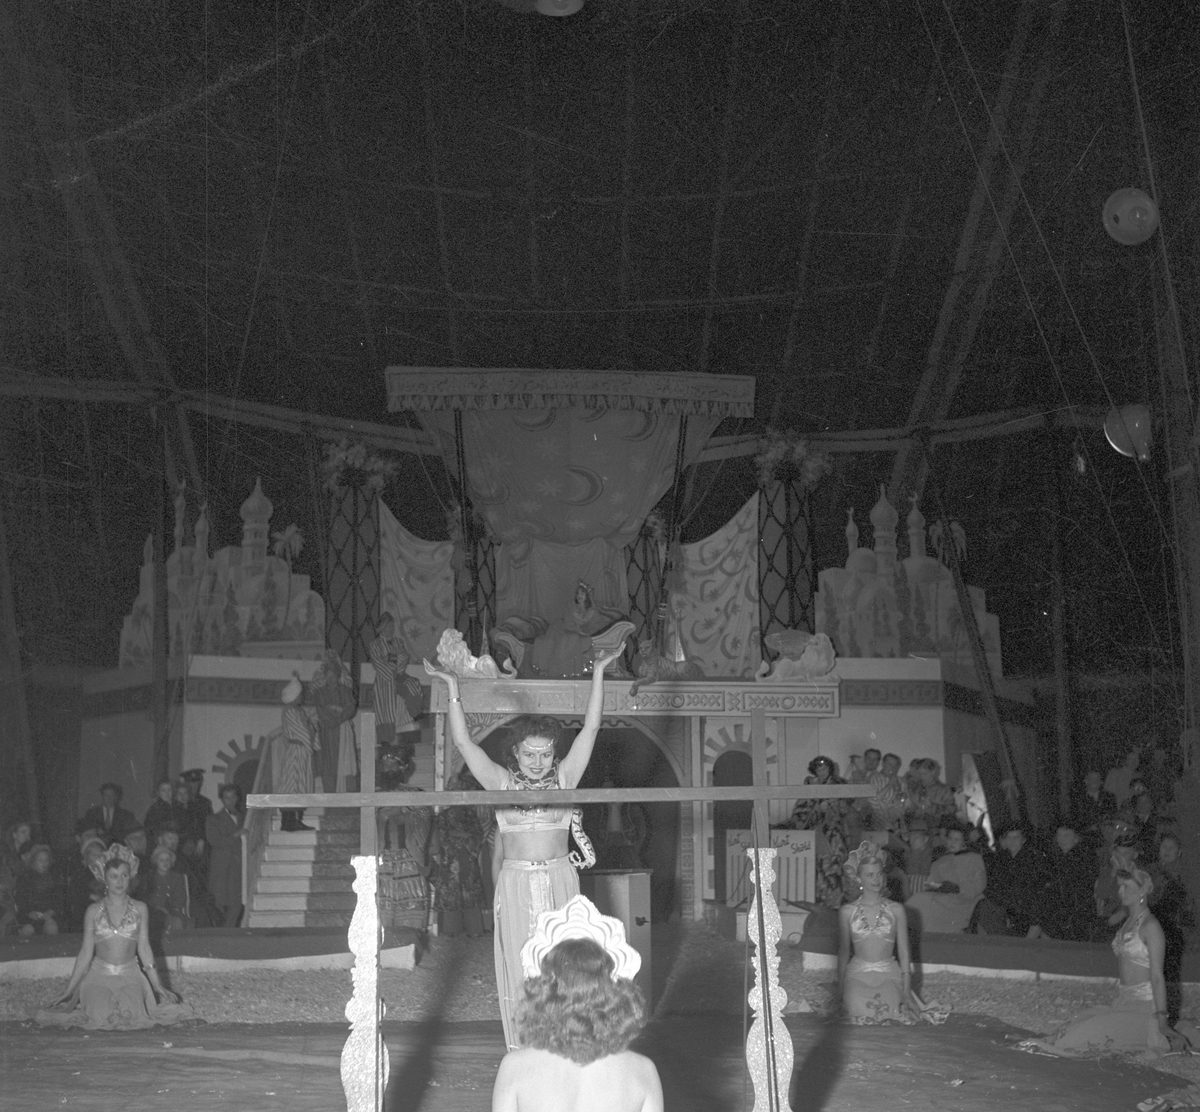 Furuviksparken invigdes pingstdagen 1936.  Akrobatik